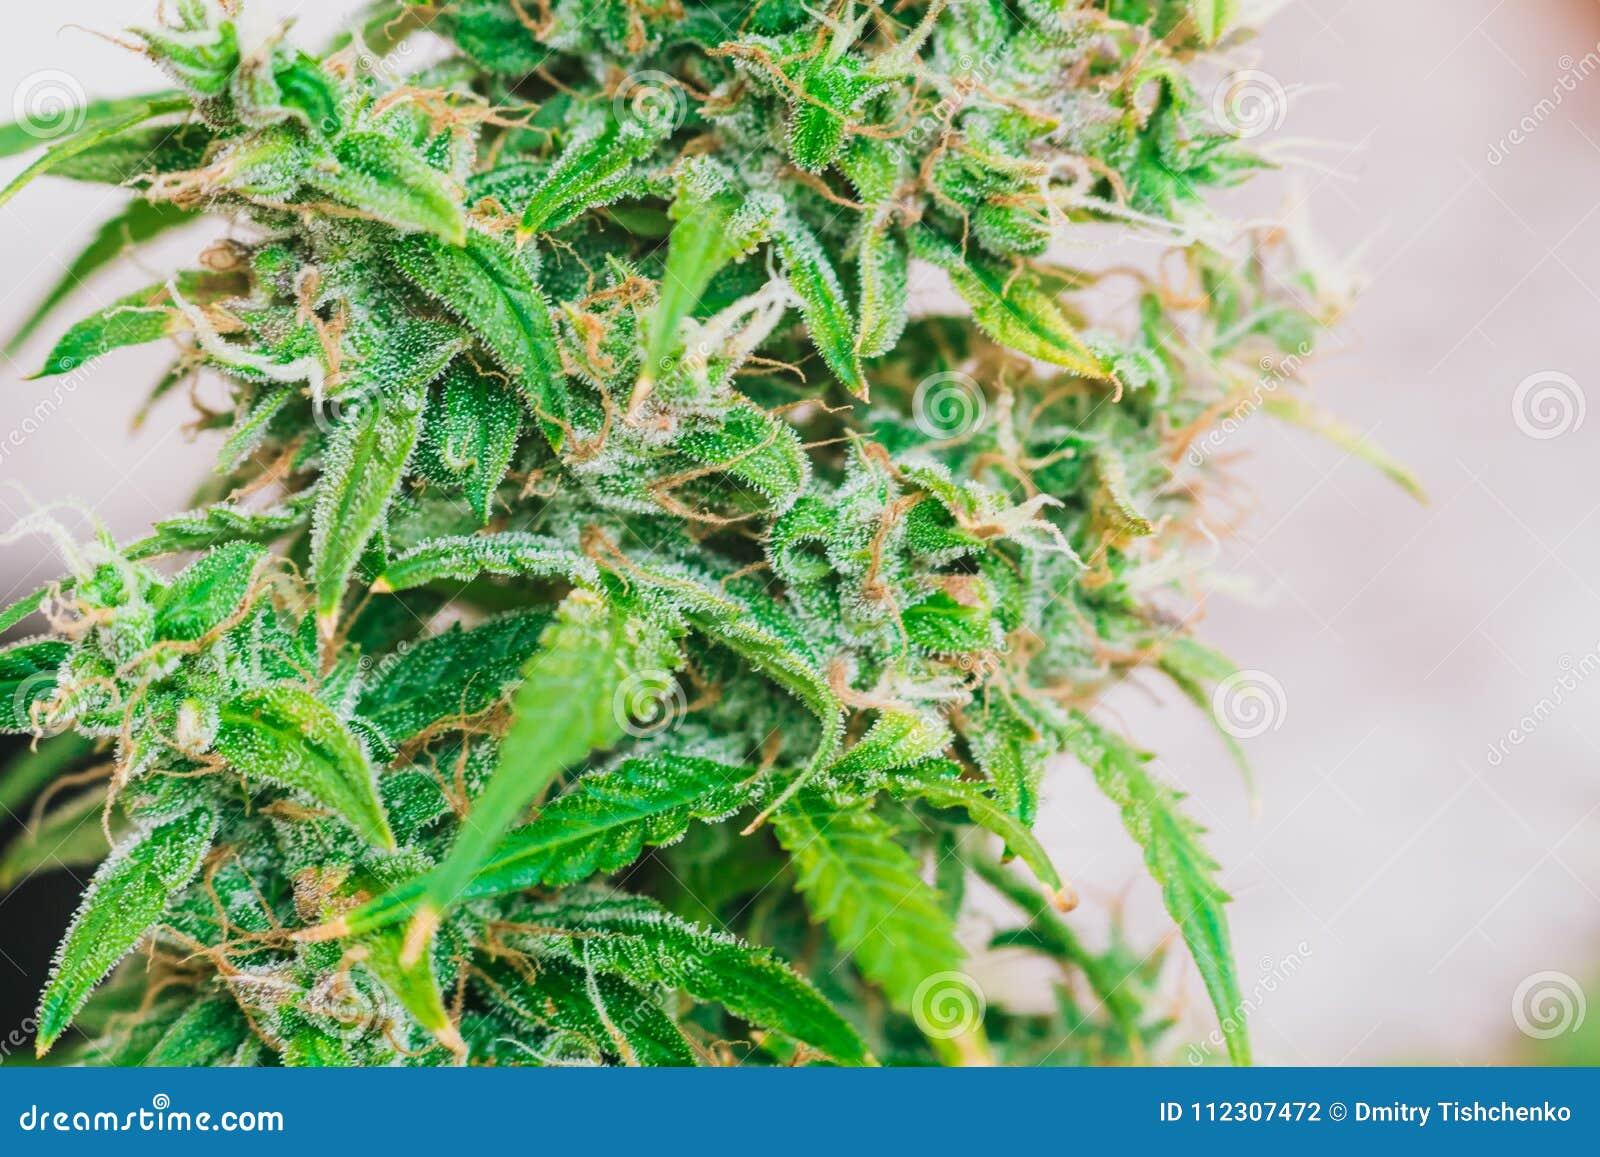 Macro Bud Cannabis, Medicinal Marijuana Cbd Thc  Concepts Of